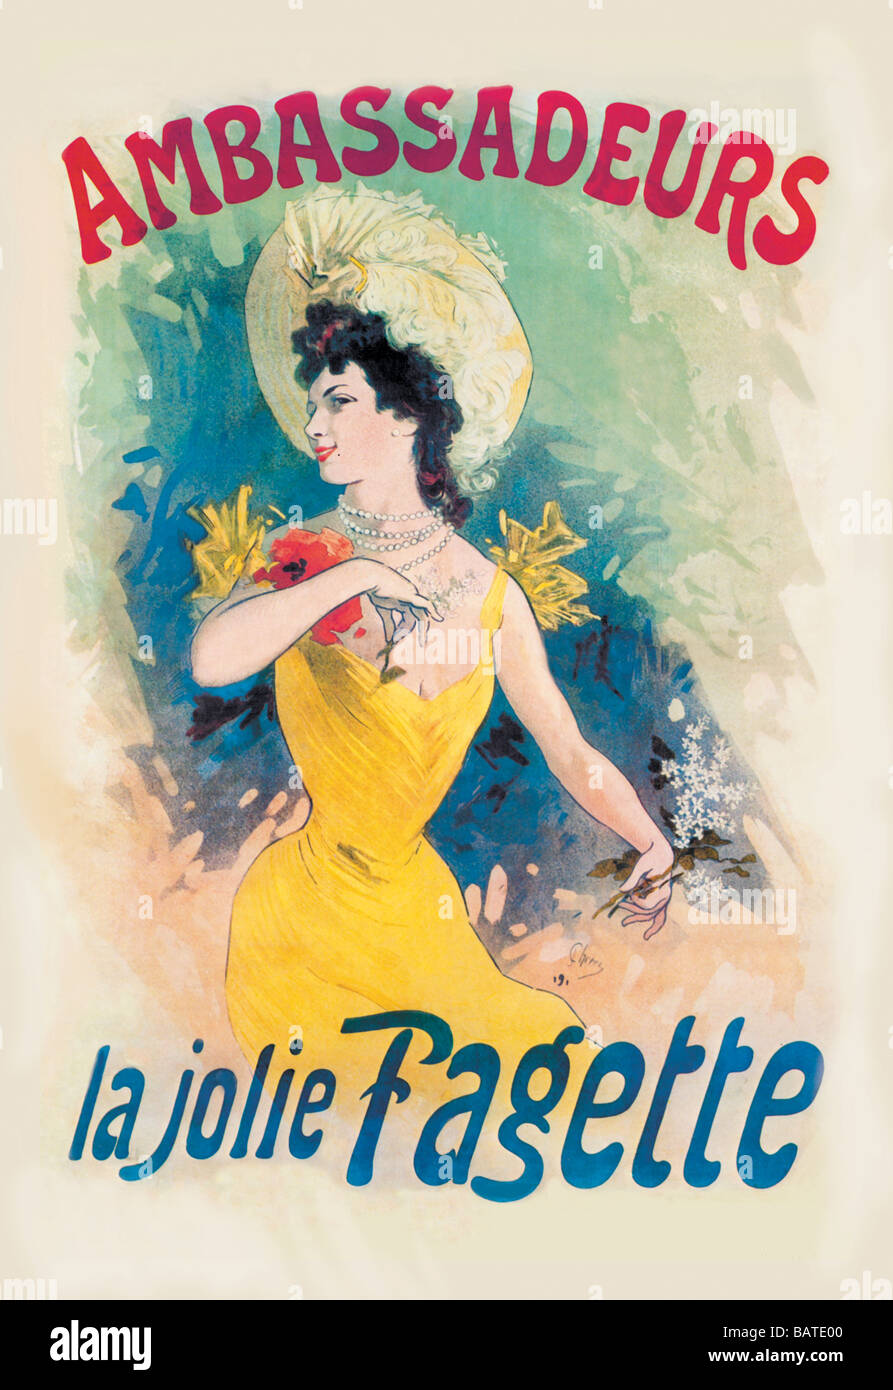 Ambassadeurs: La Jolie Fagette Foto Stock